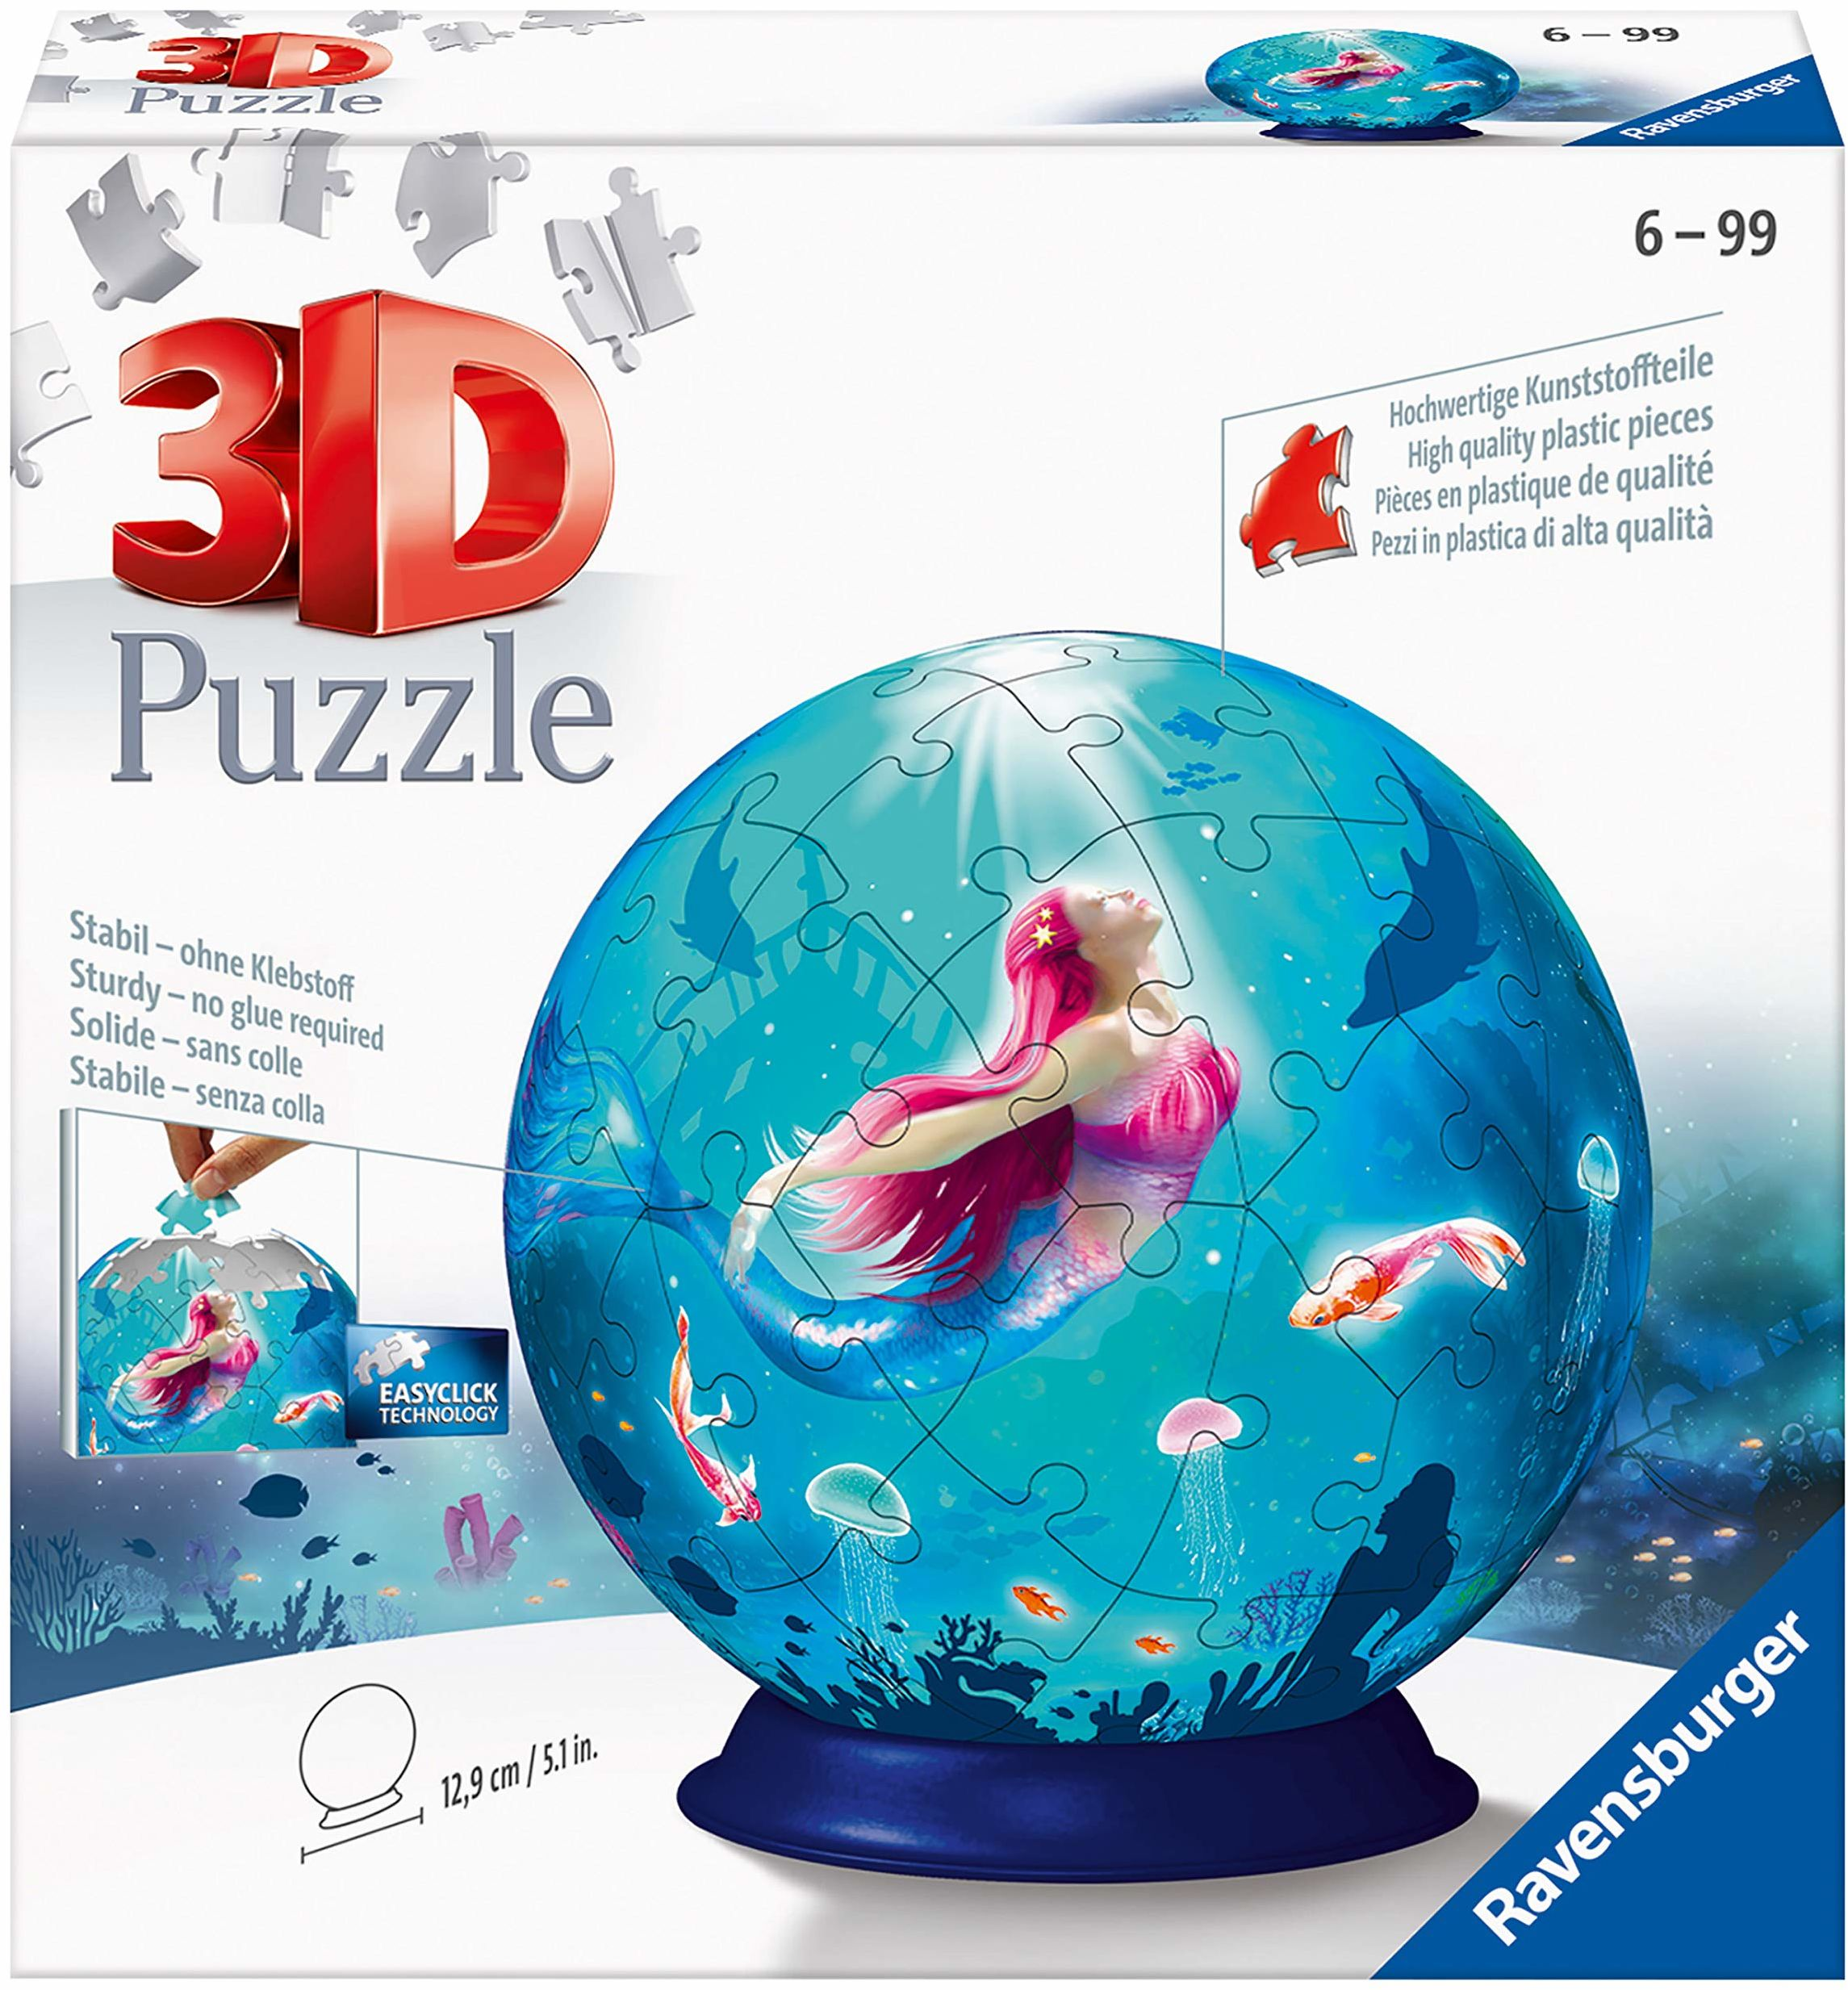 Ravensburger Puzzle 11250 kula puzzle czarująca syrenka Ravensburger 3D 11250 czarująca syrenka - 72 części od 6 lat, wielokolorowa